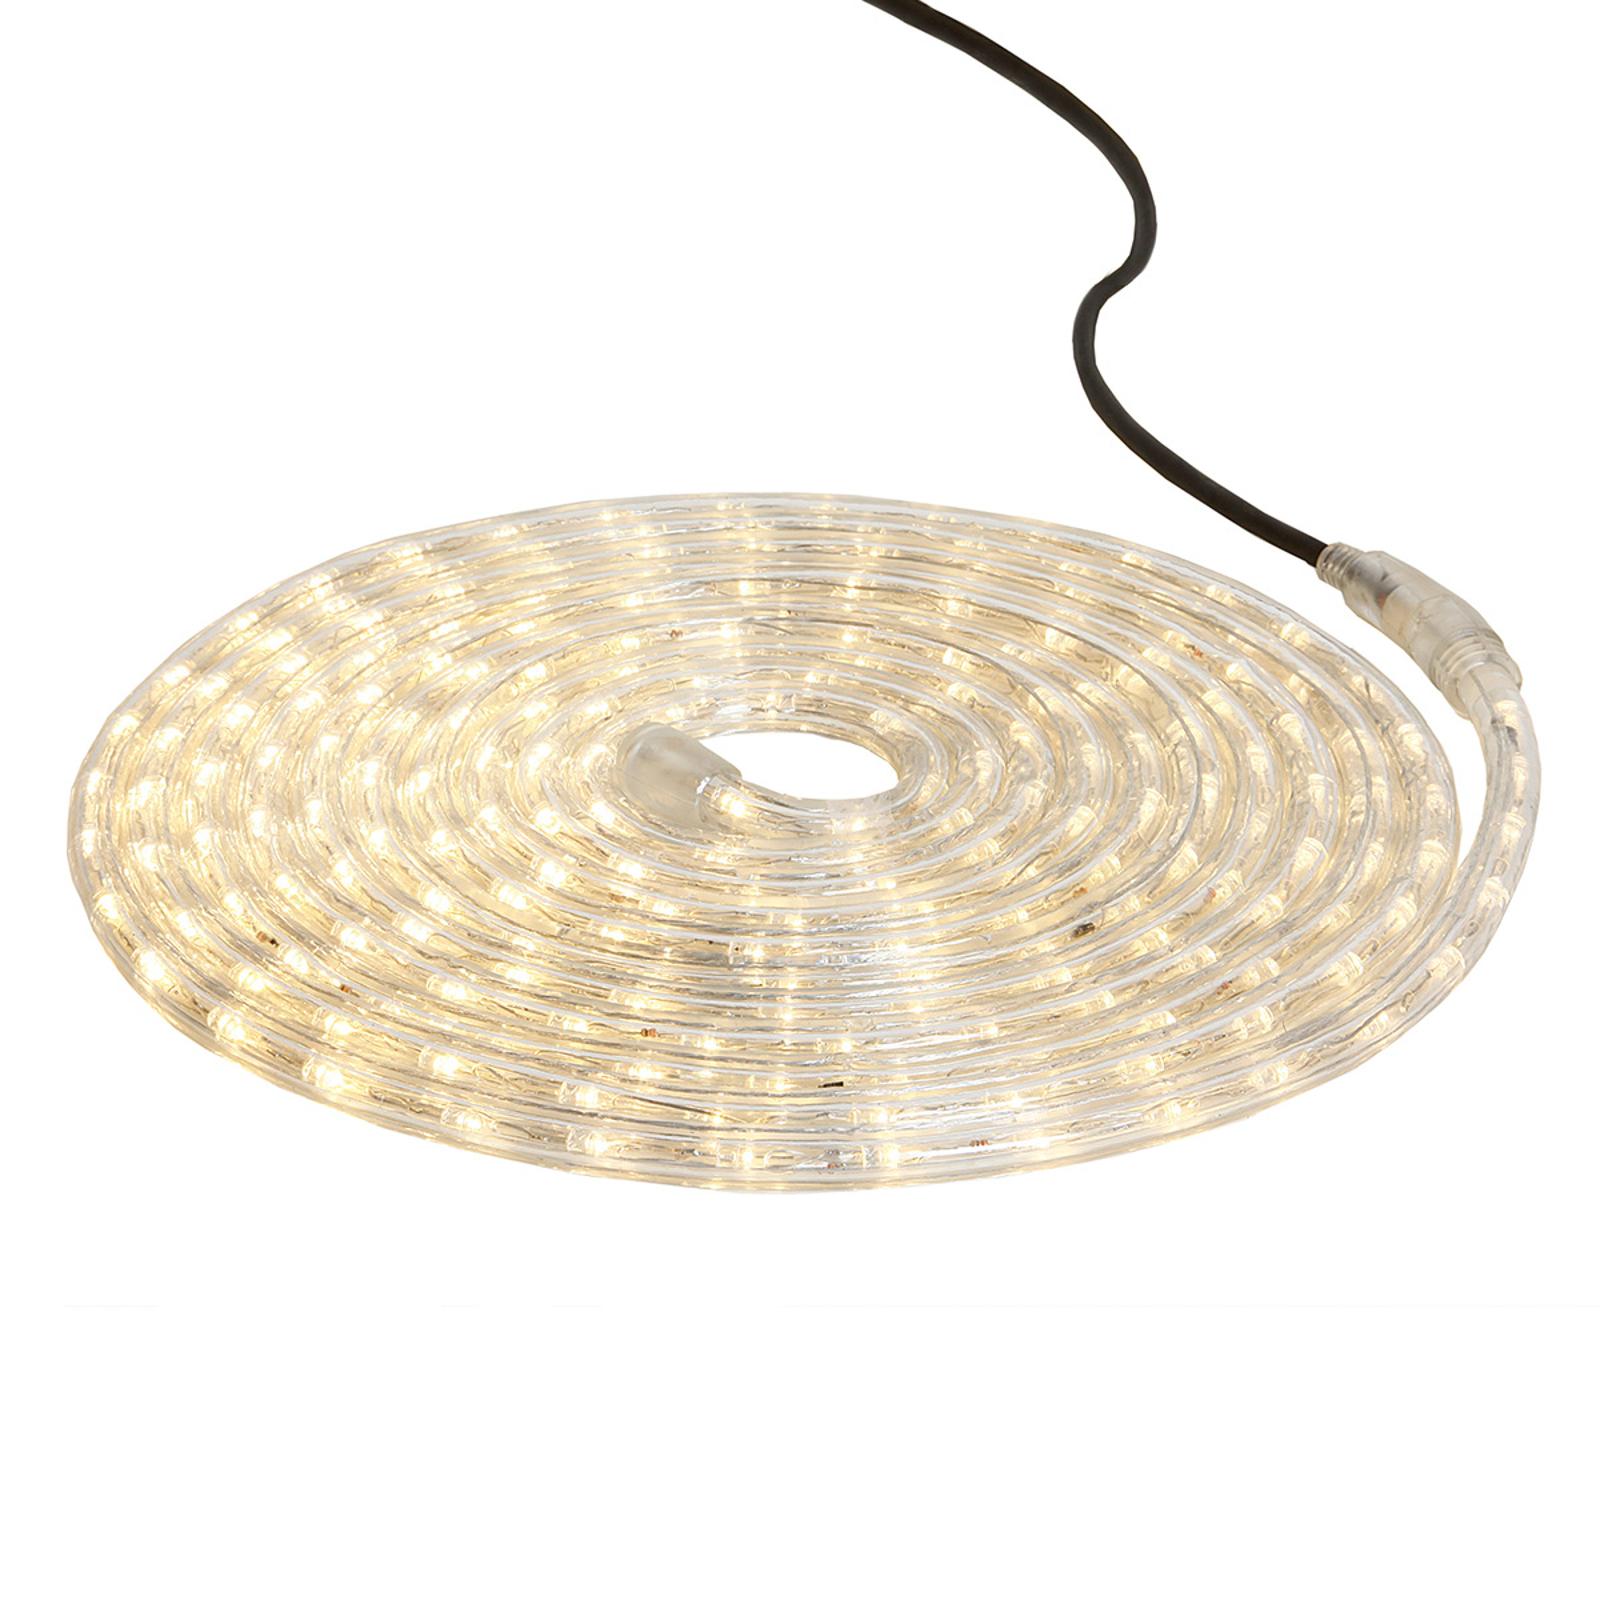 Tubo luminoso LED Ropelight Flex 6m bianco caldo